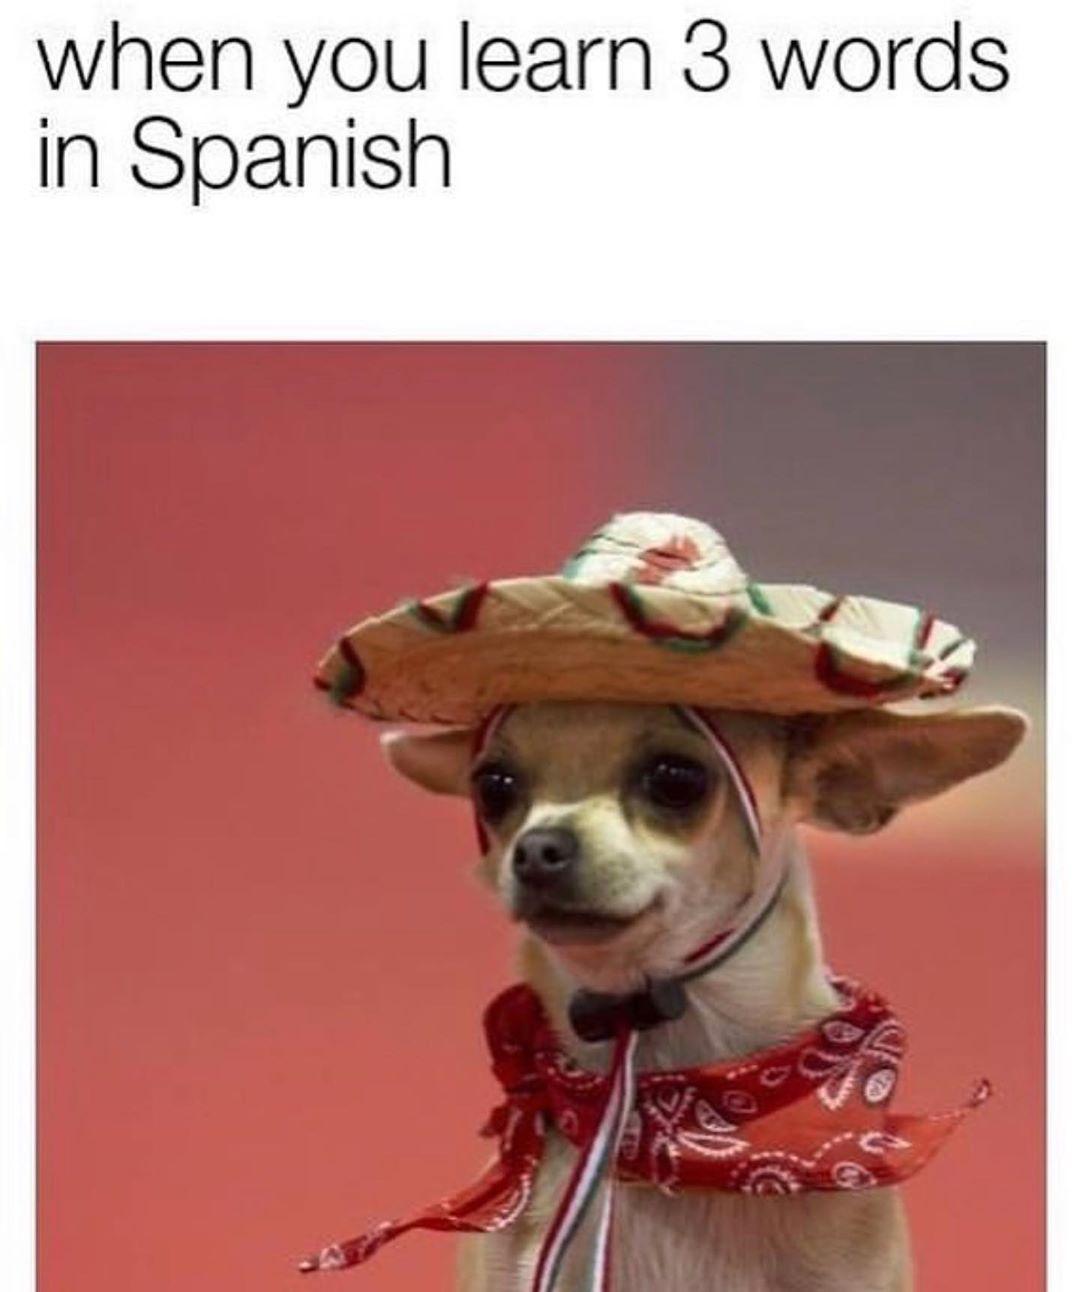 Top Funny Memes Trend 2020 Inspiration Funny Memes Tumblr Memes Memes Quotes Funny Meme Pretty Memes I Me In 2020 Funny Animal Memes Really Funny Memes Funny Dog Memes